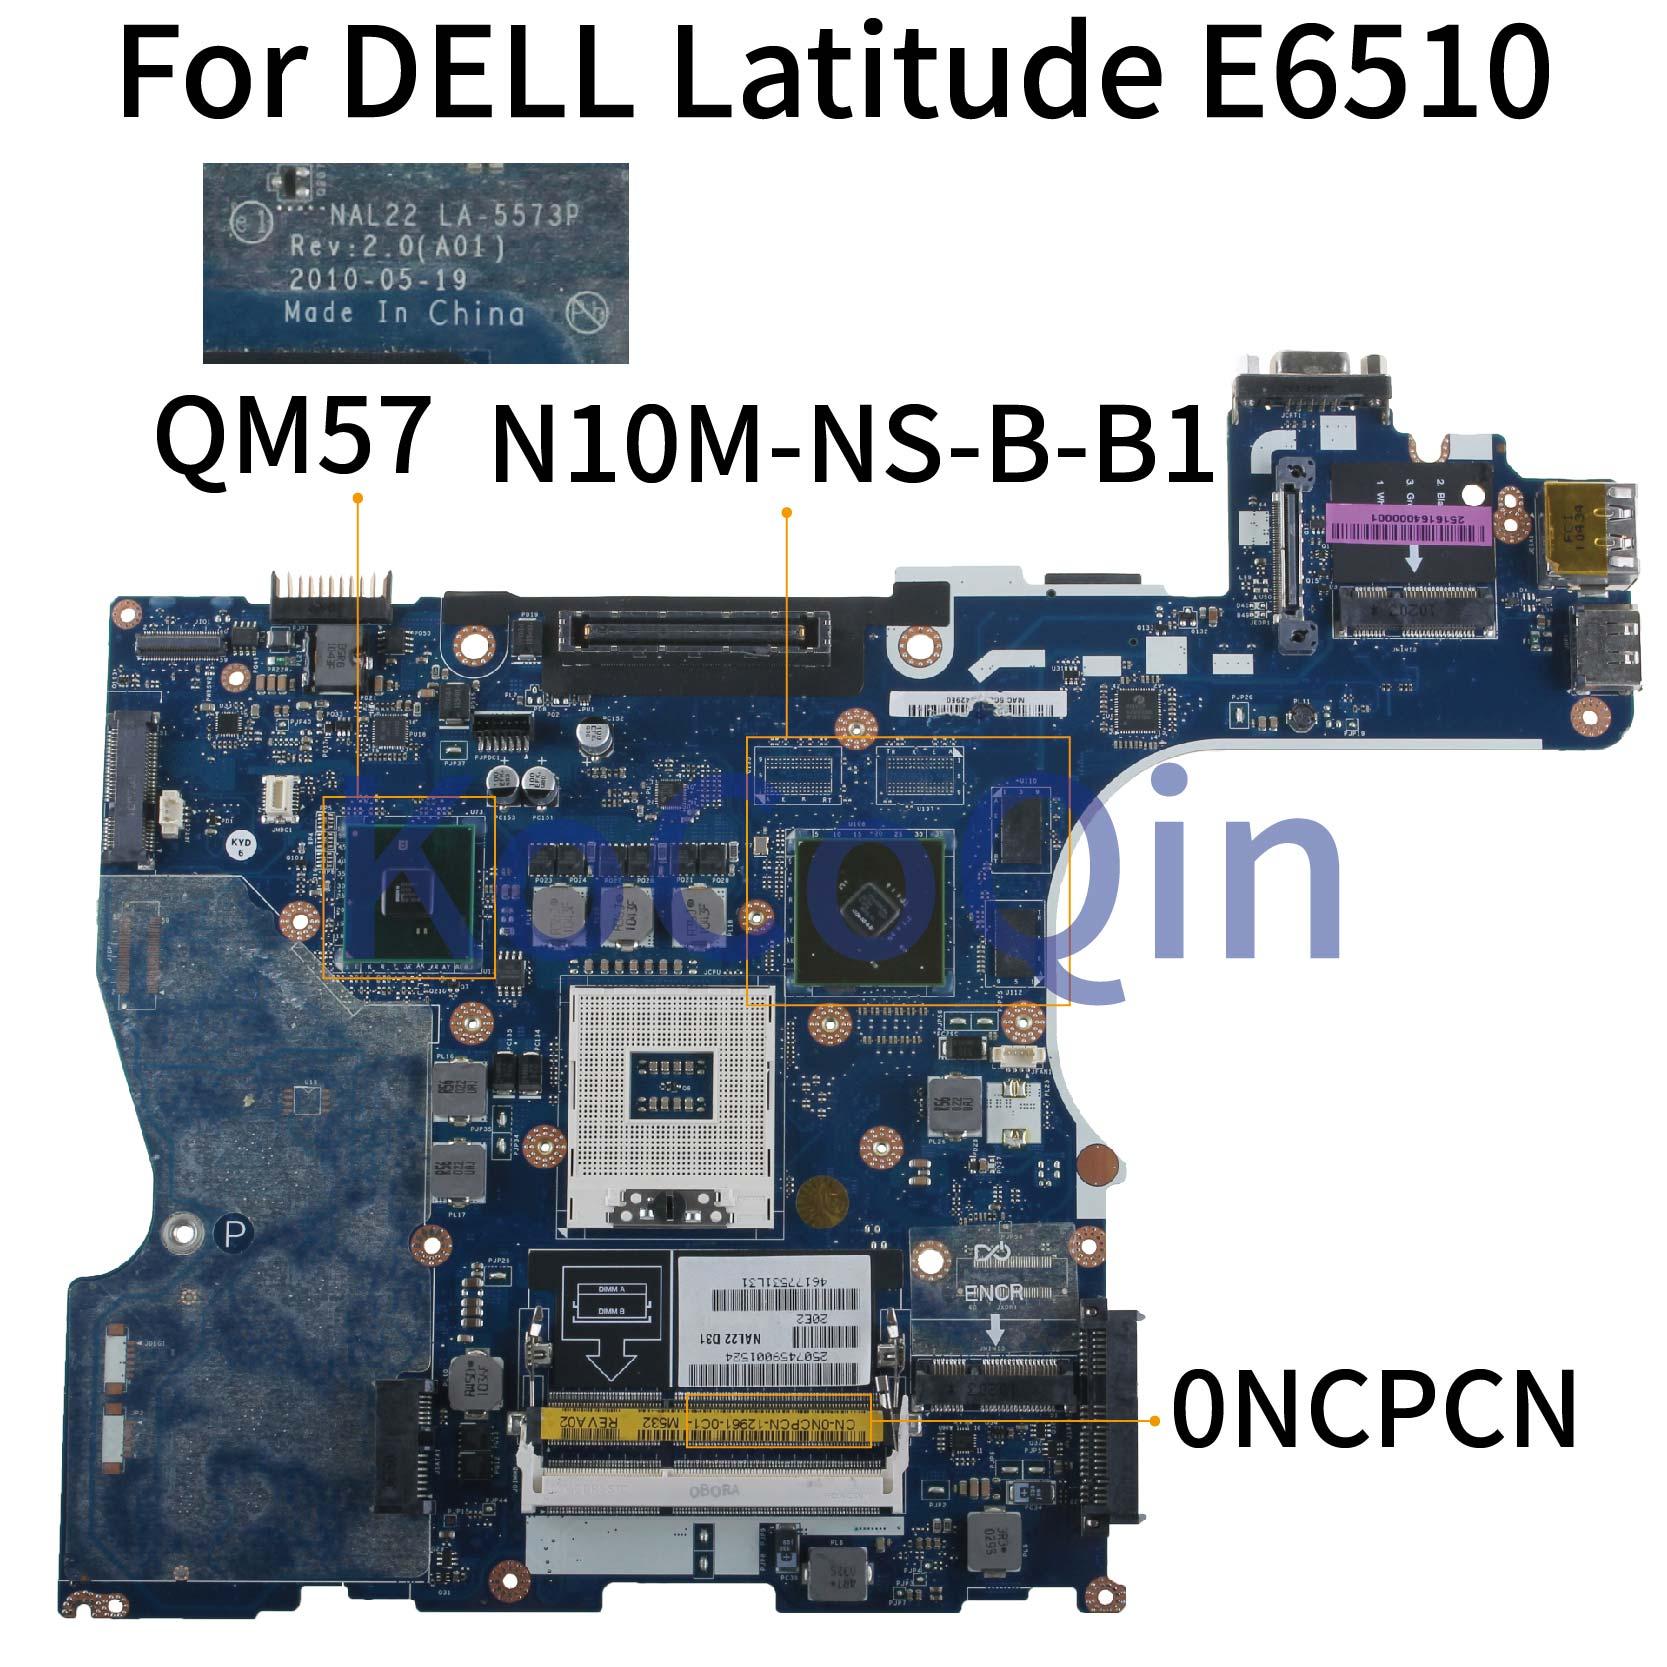 KoCoQin Laptop Motherboard For DELL Latitude E6510 QM57 Mainboard CN-0NCPCN 0NCPCN NAL22 LA-5573P N10M-NS-B-B1